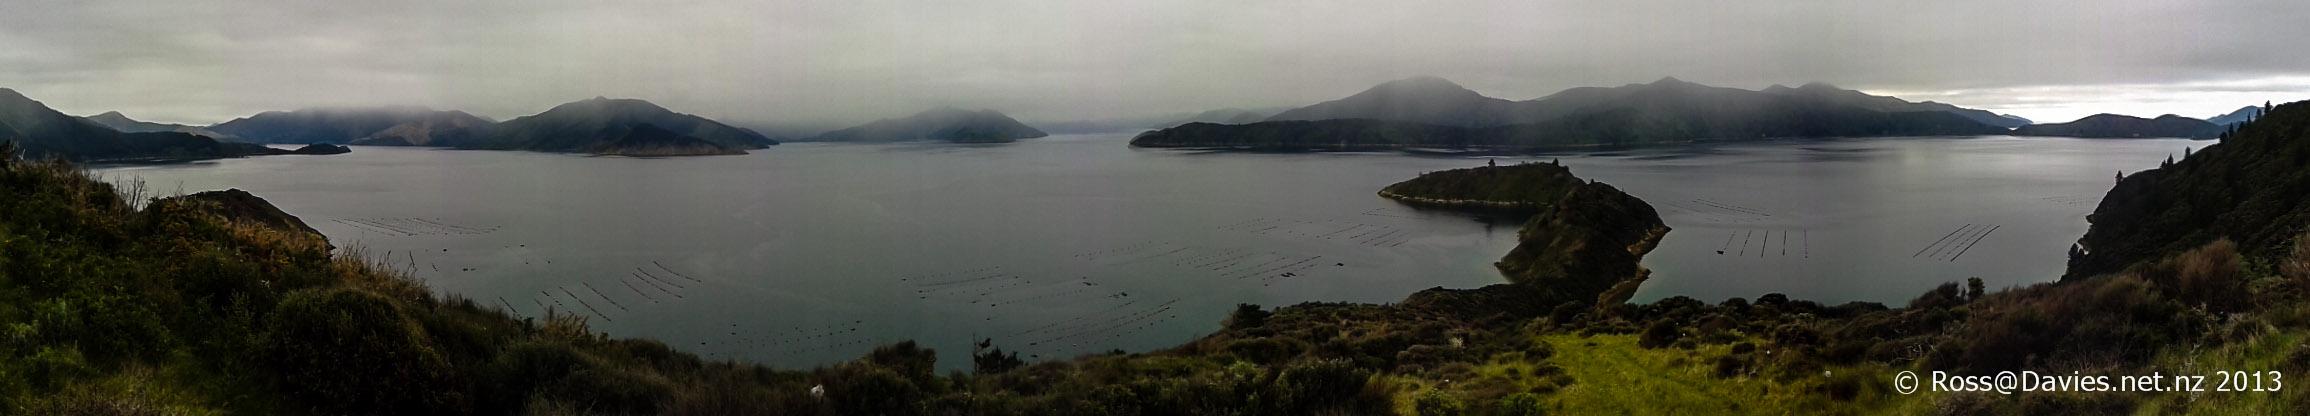 Te Puraka Point Marlborough Sounds